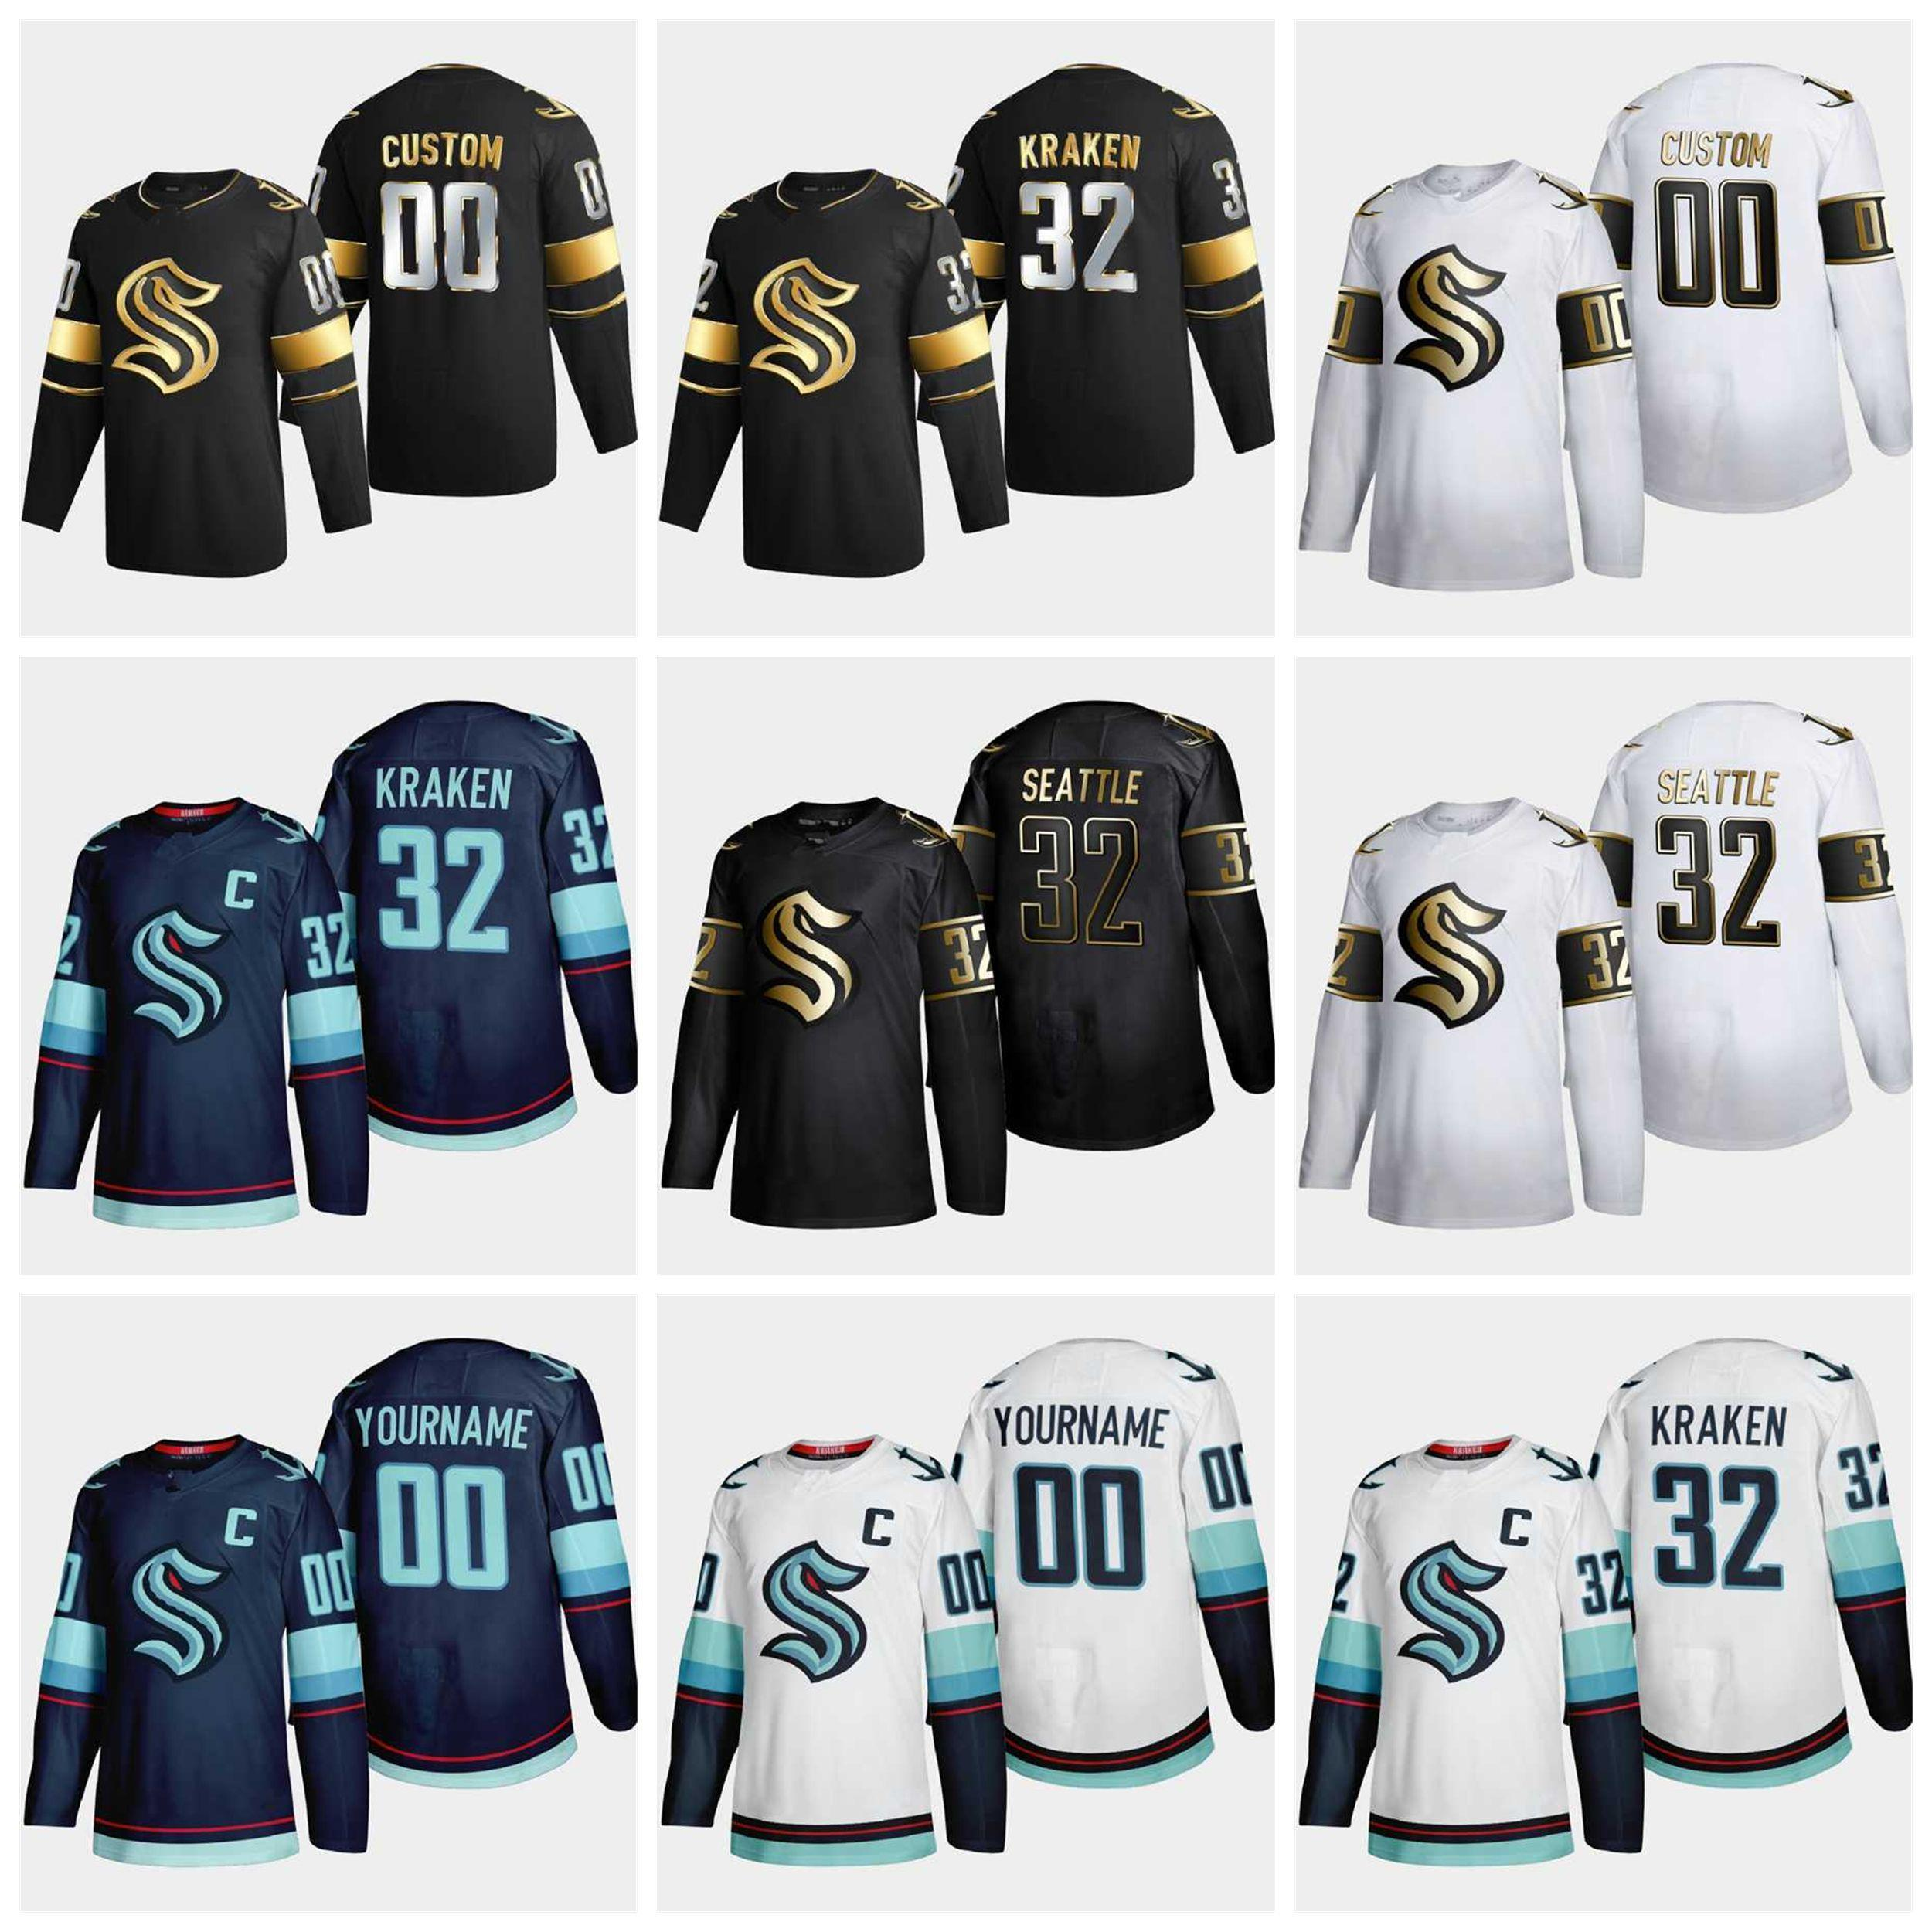 Seattle Kraken Ice Hockey Jerseys 2021 Season Black Golden Edition Mens Womens Youth Kids Custom Stitched